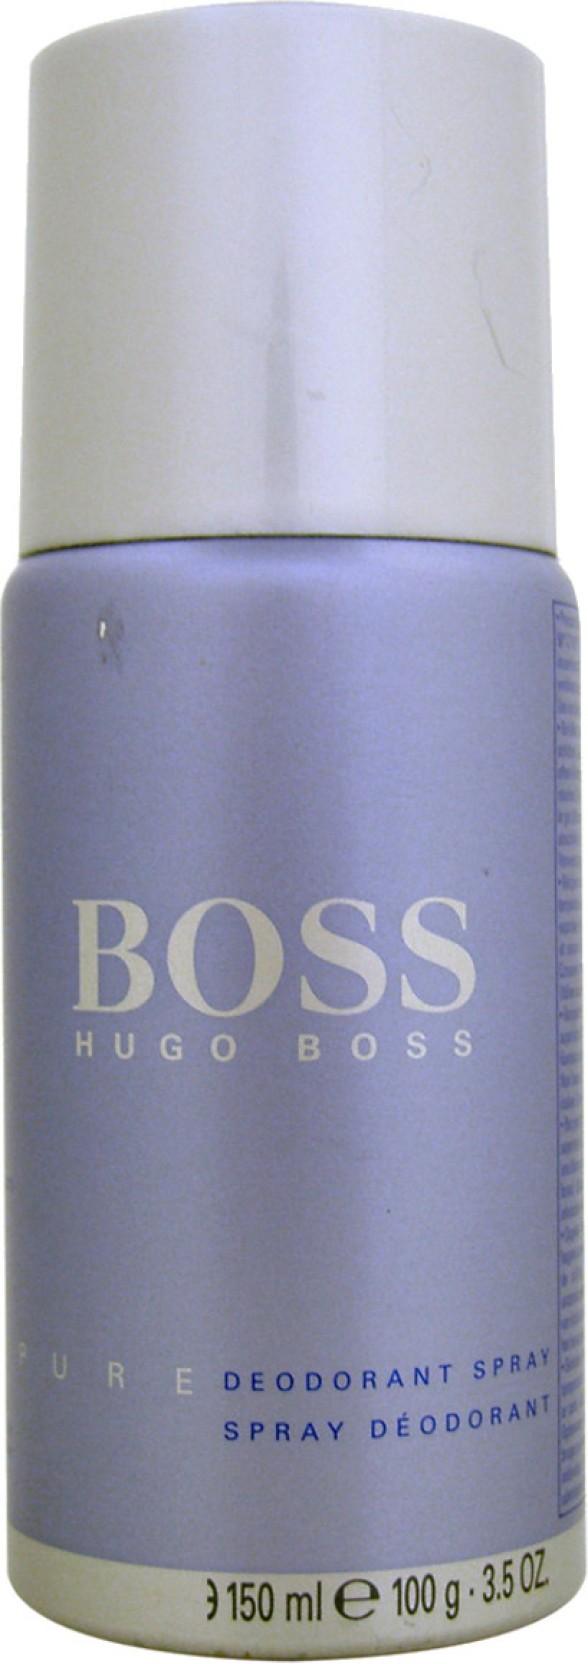 aa84417d0f Hugo Boss Pure Deodorant Spray - For Men - Price in India, Buy Hugo ...